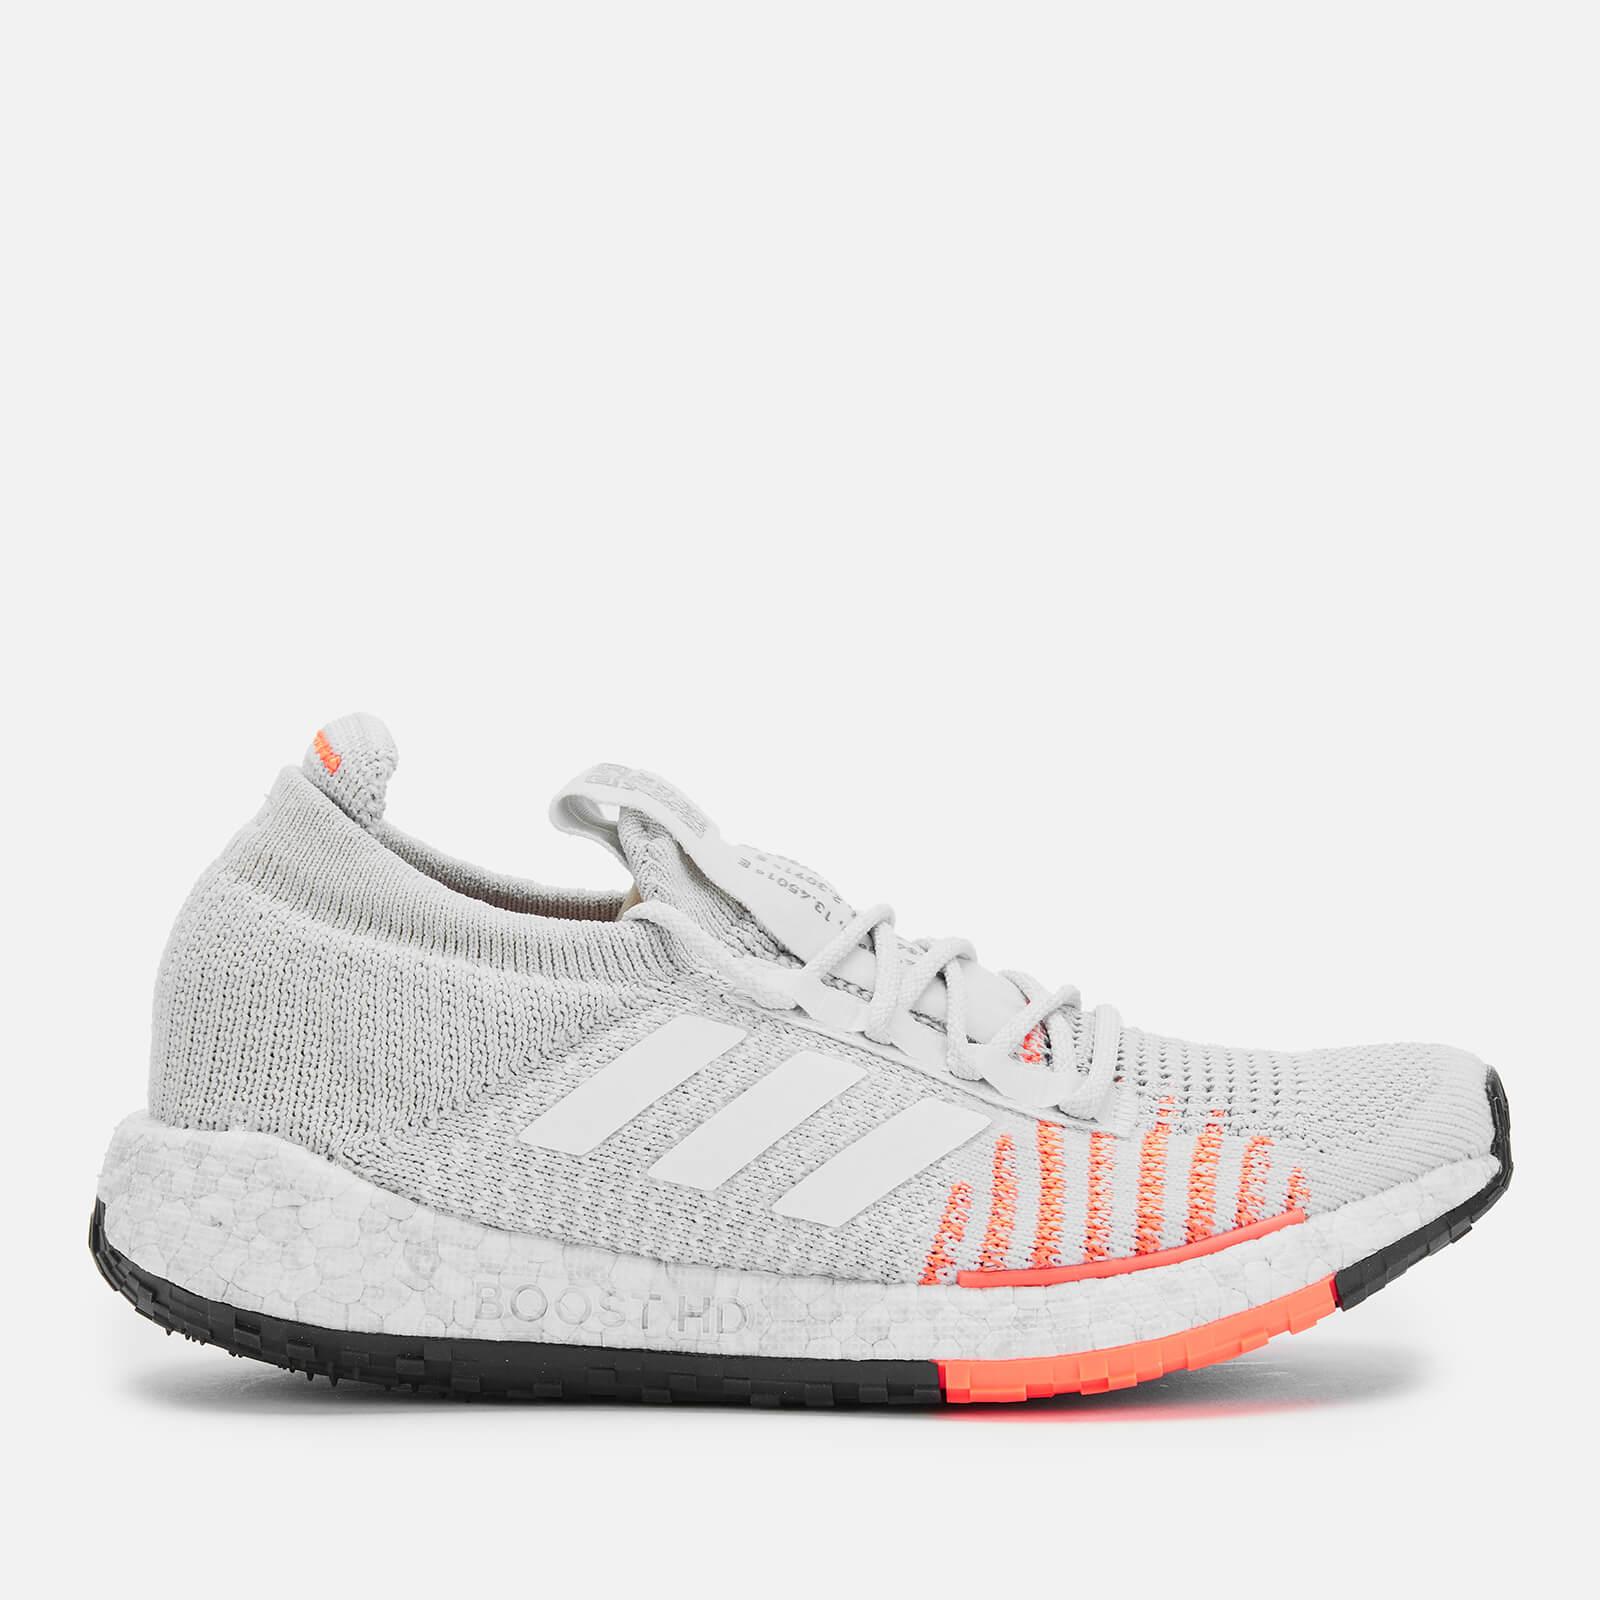 adidas Women's Pulse Boost HD Trainers - Grey/Orange - UK 5 - Grey